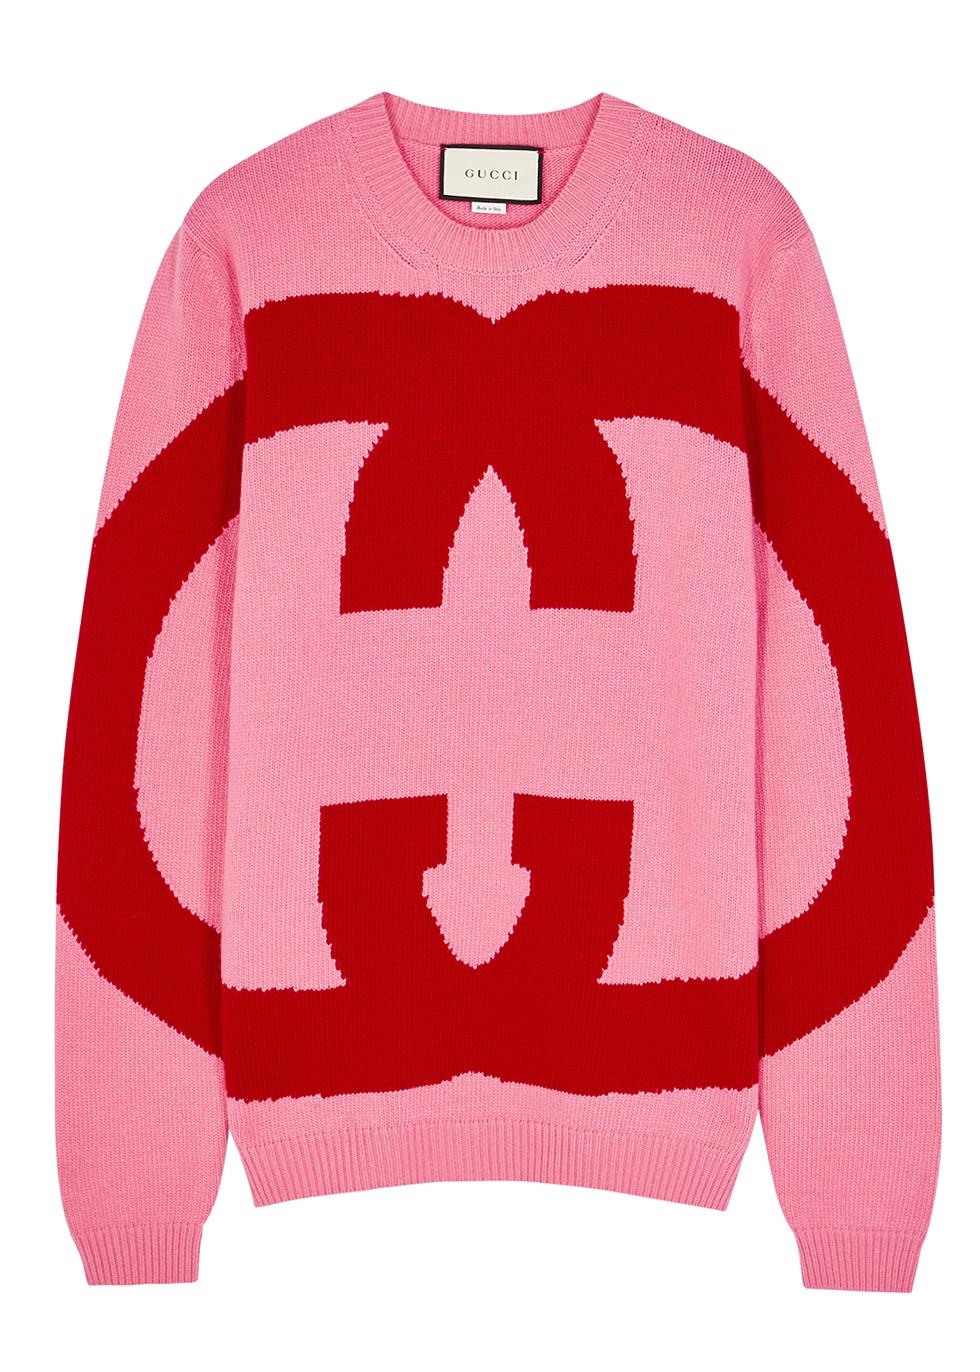 684fc307bef Gucci - Womens - Harvey Nichols